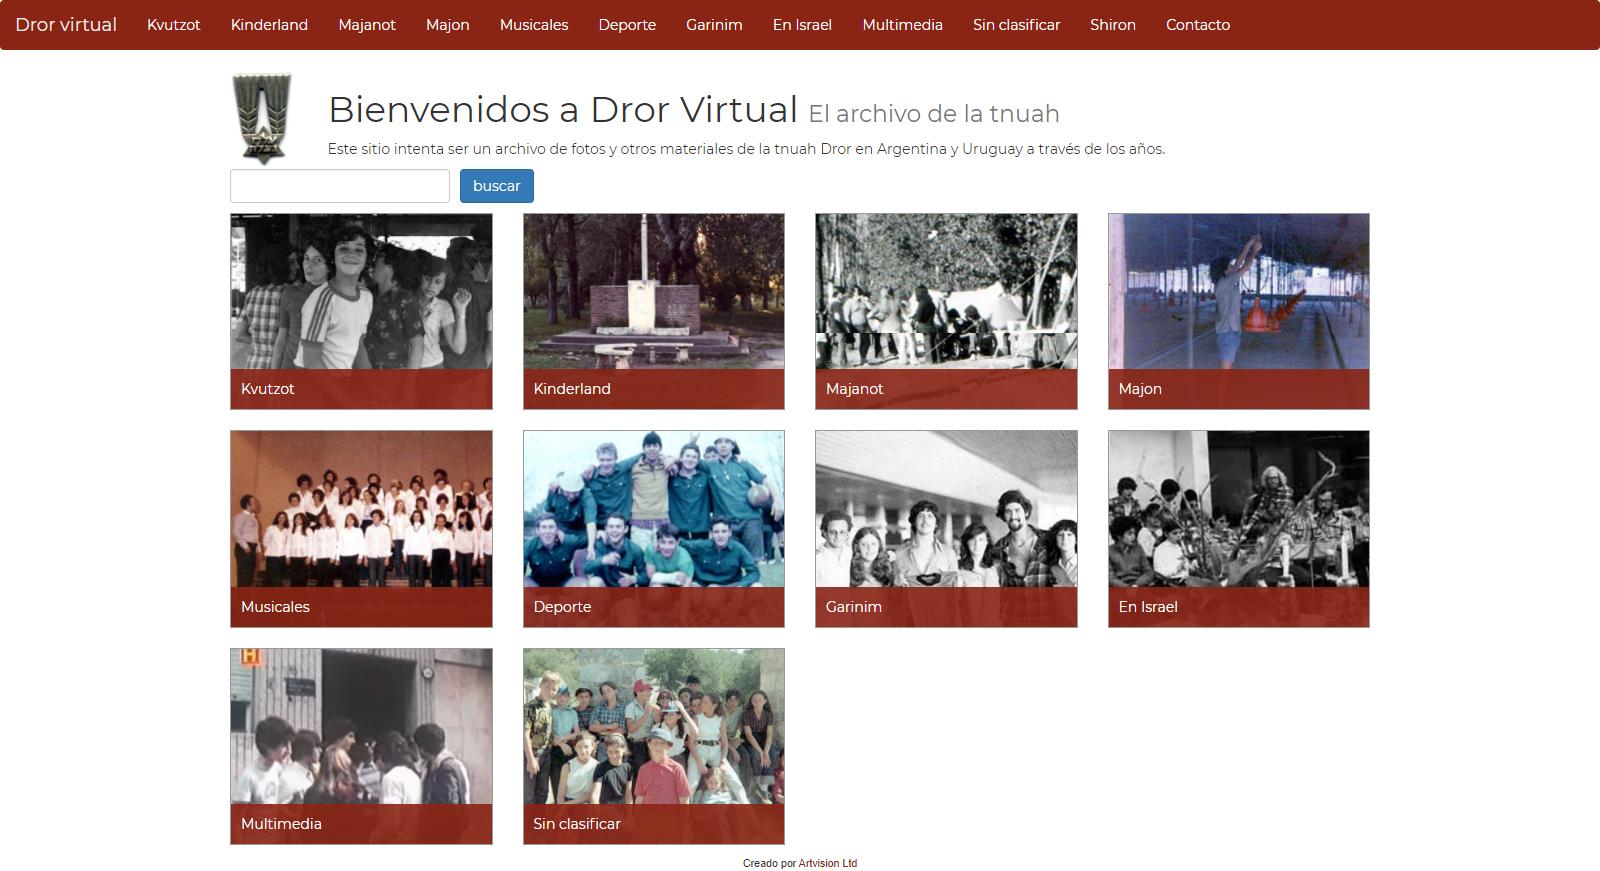 Dror virtual